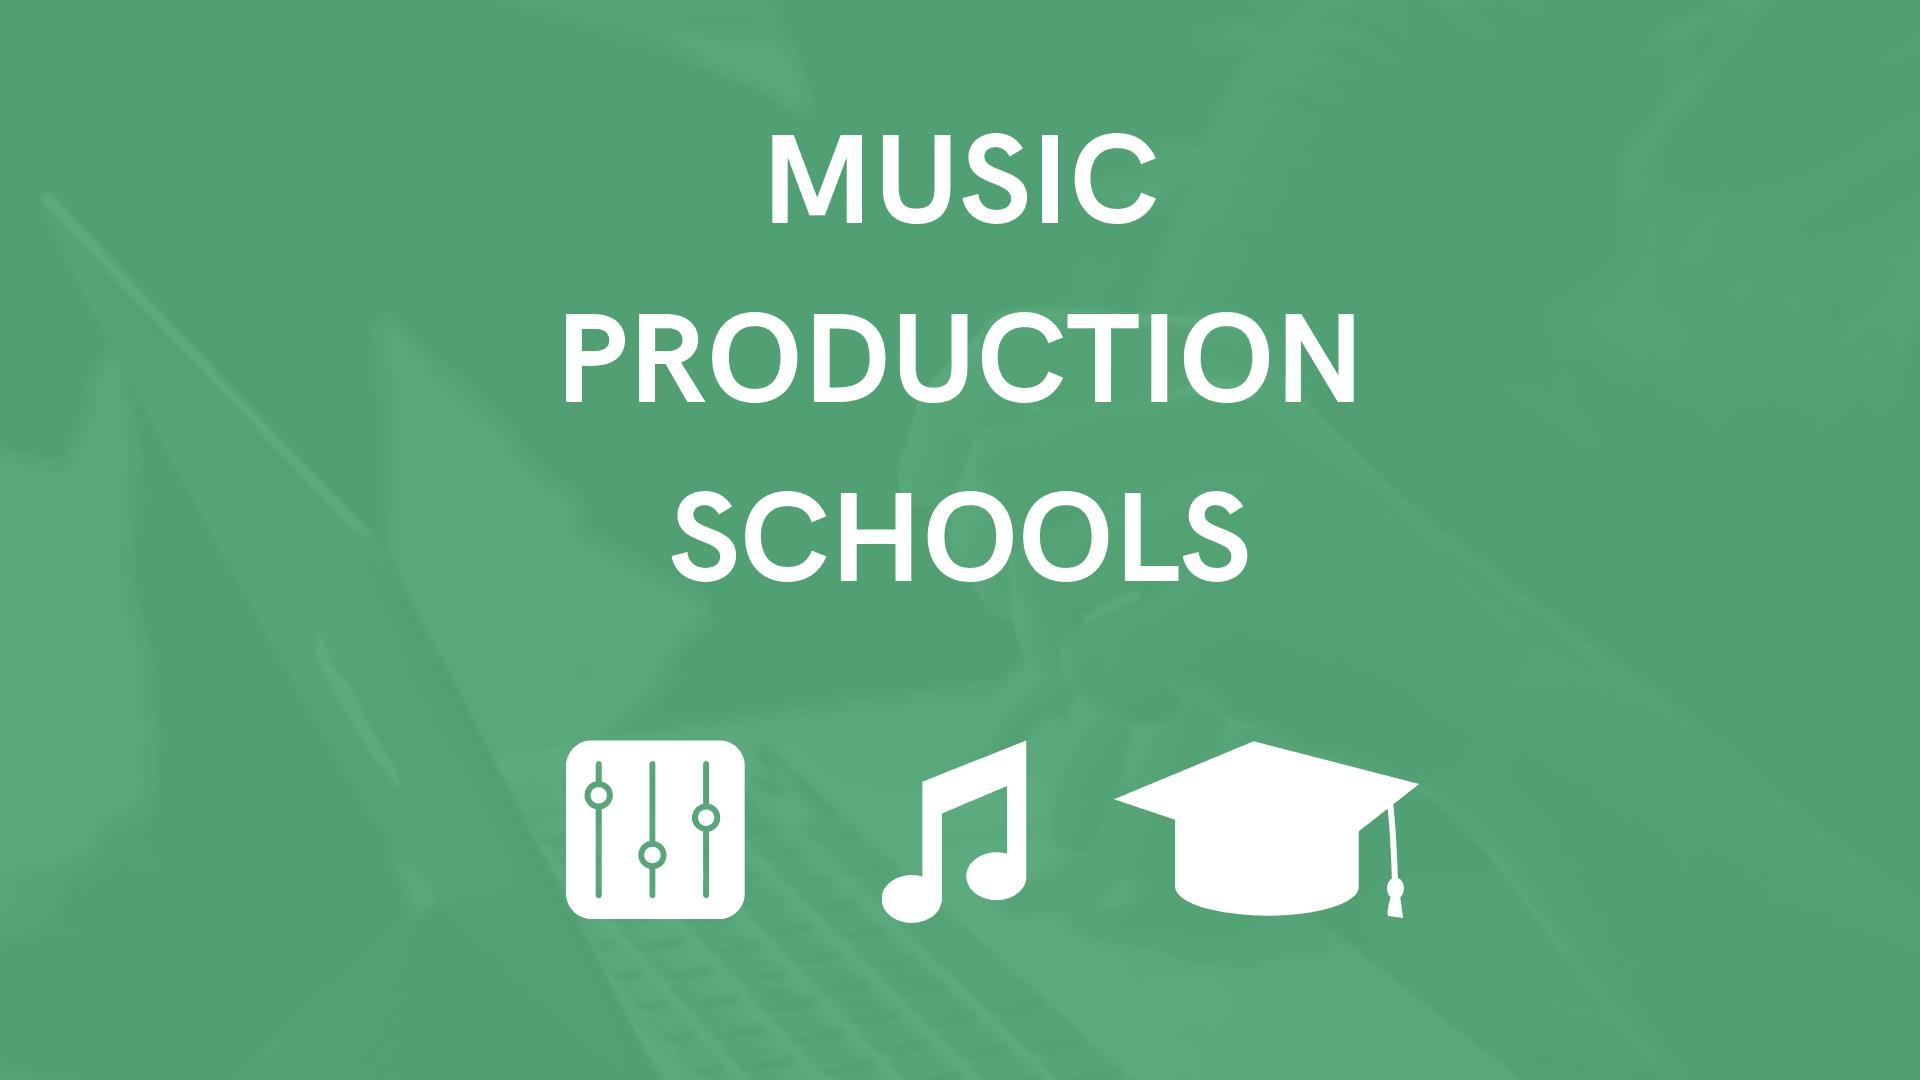 Music Production Schools